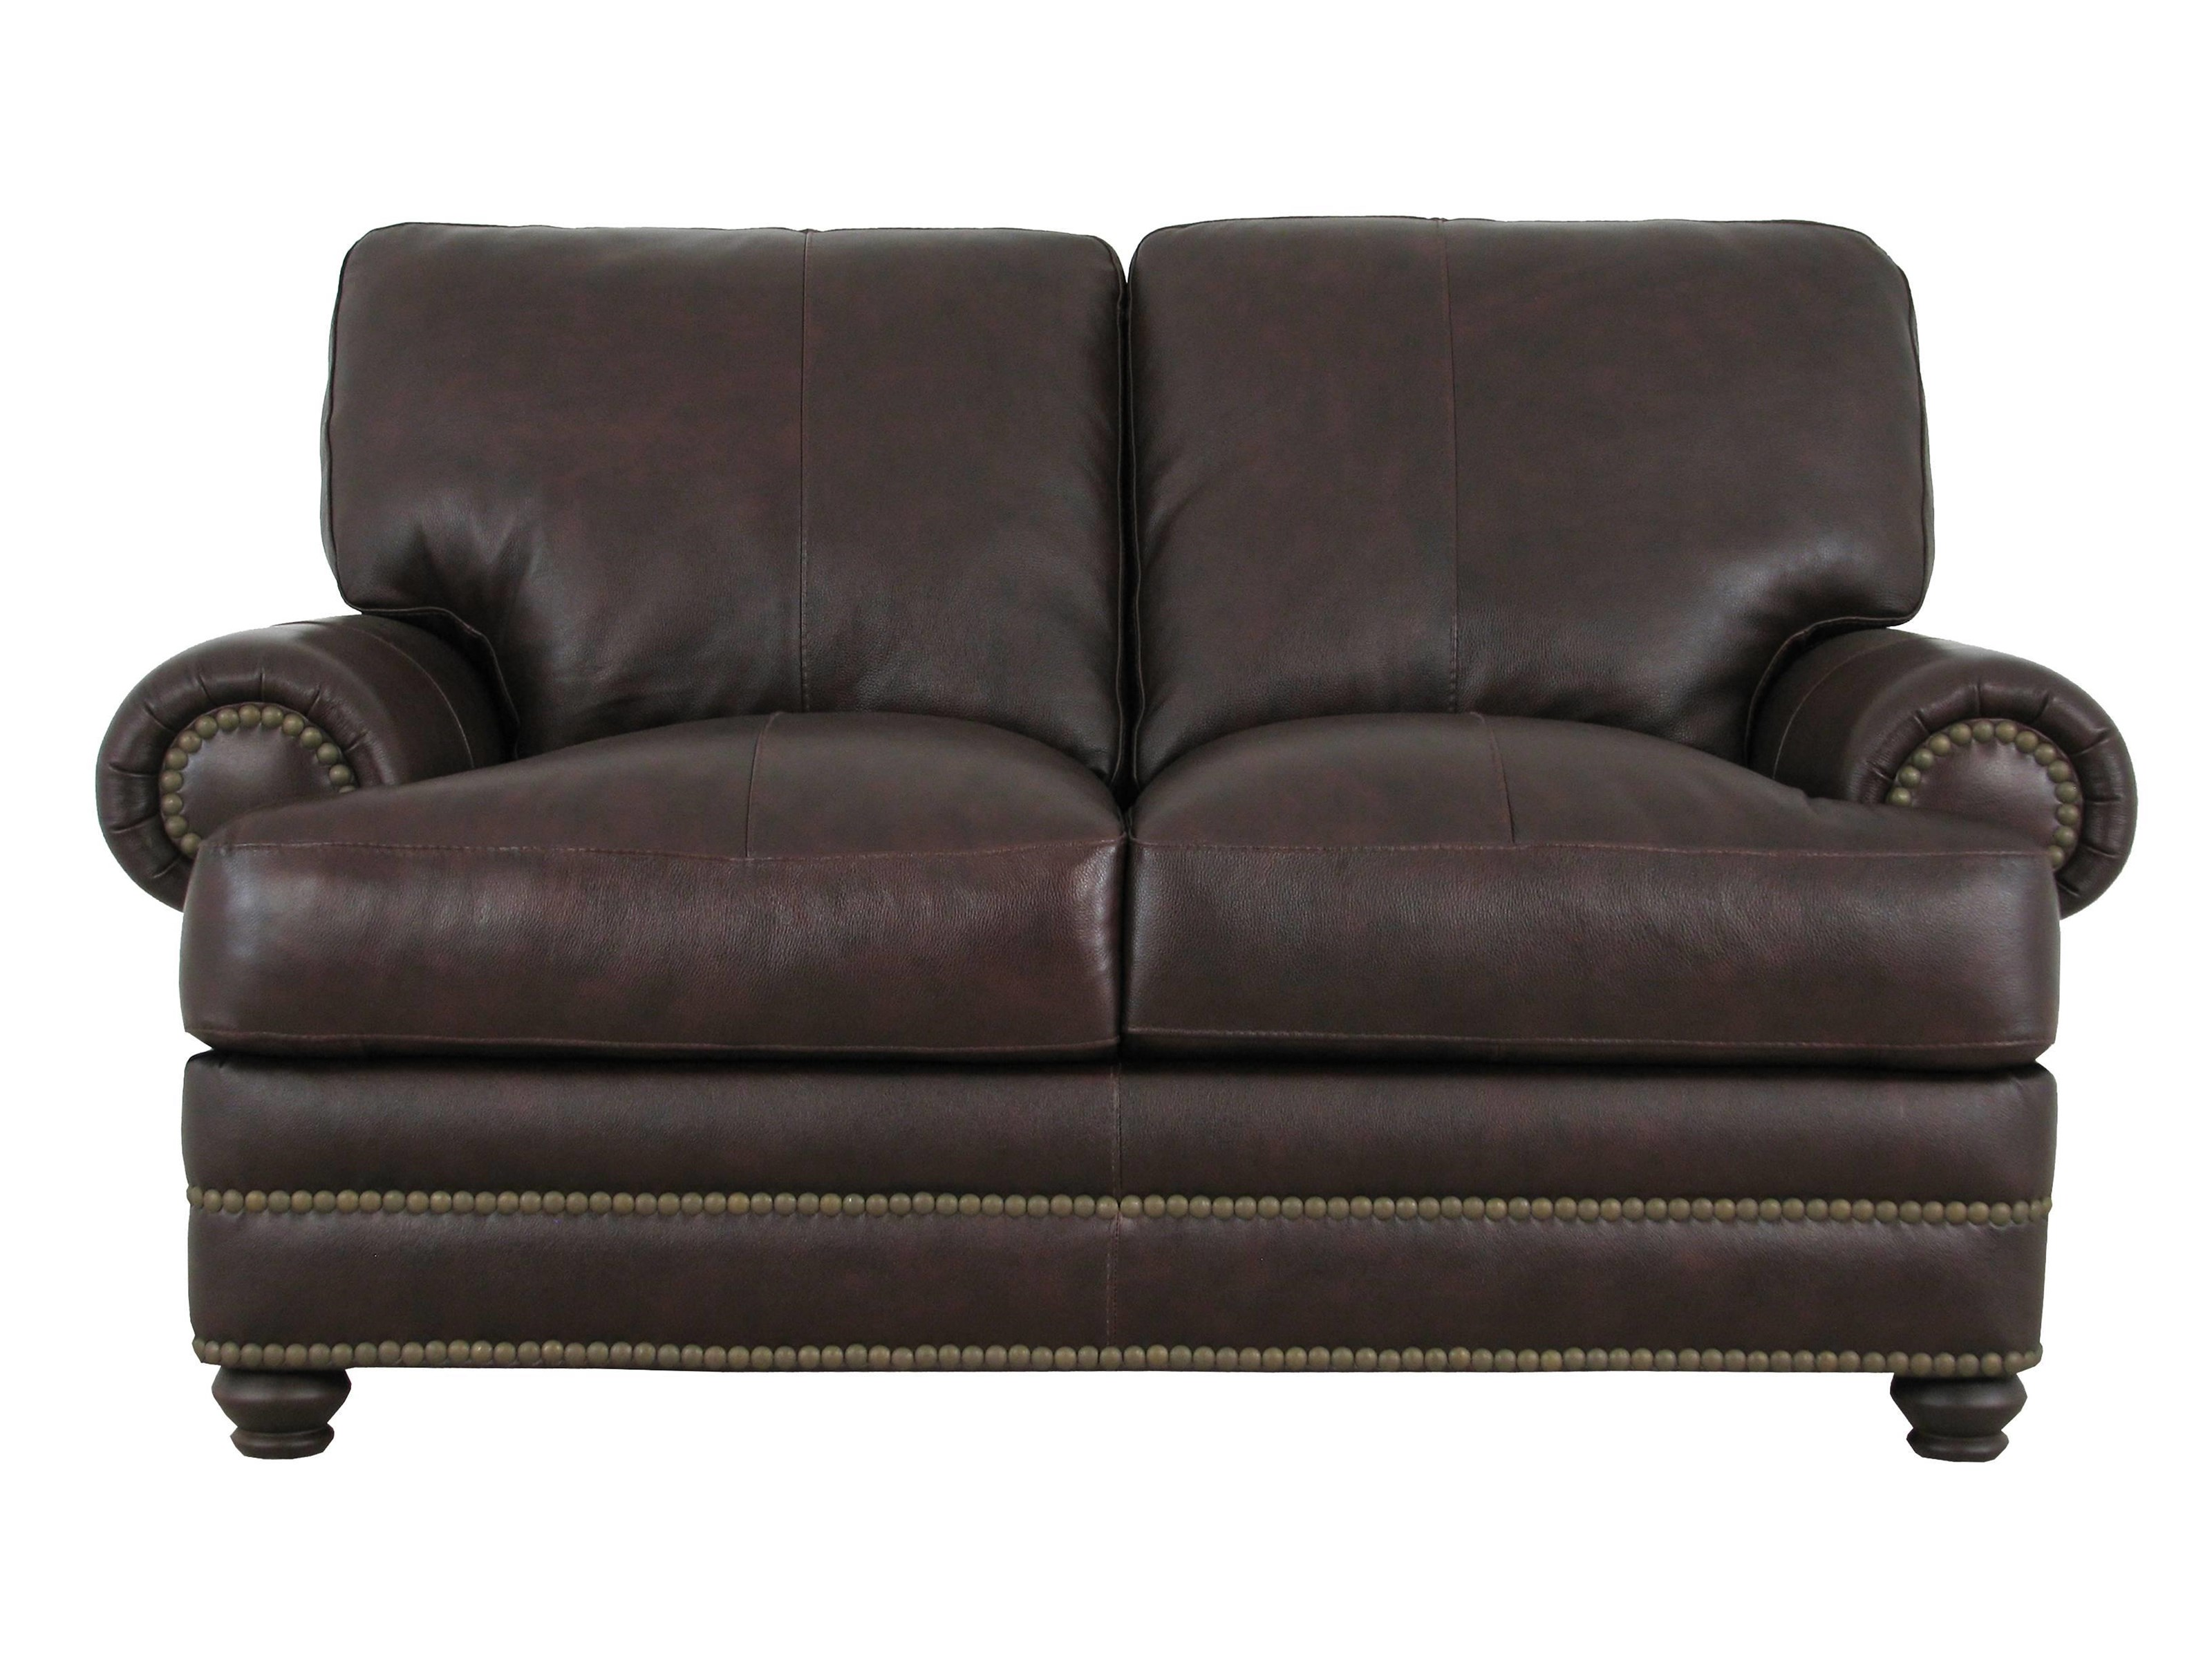 Soft Line 7103 Leather Loveseat - Item Number: 7103Loveseat